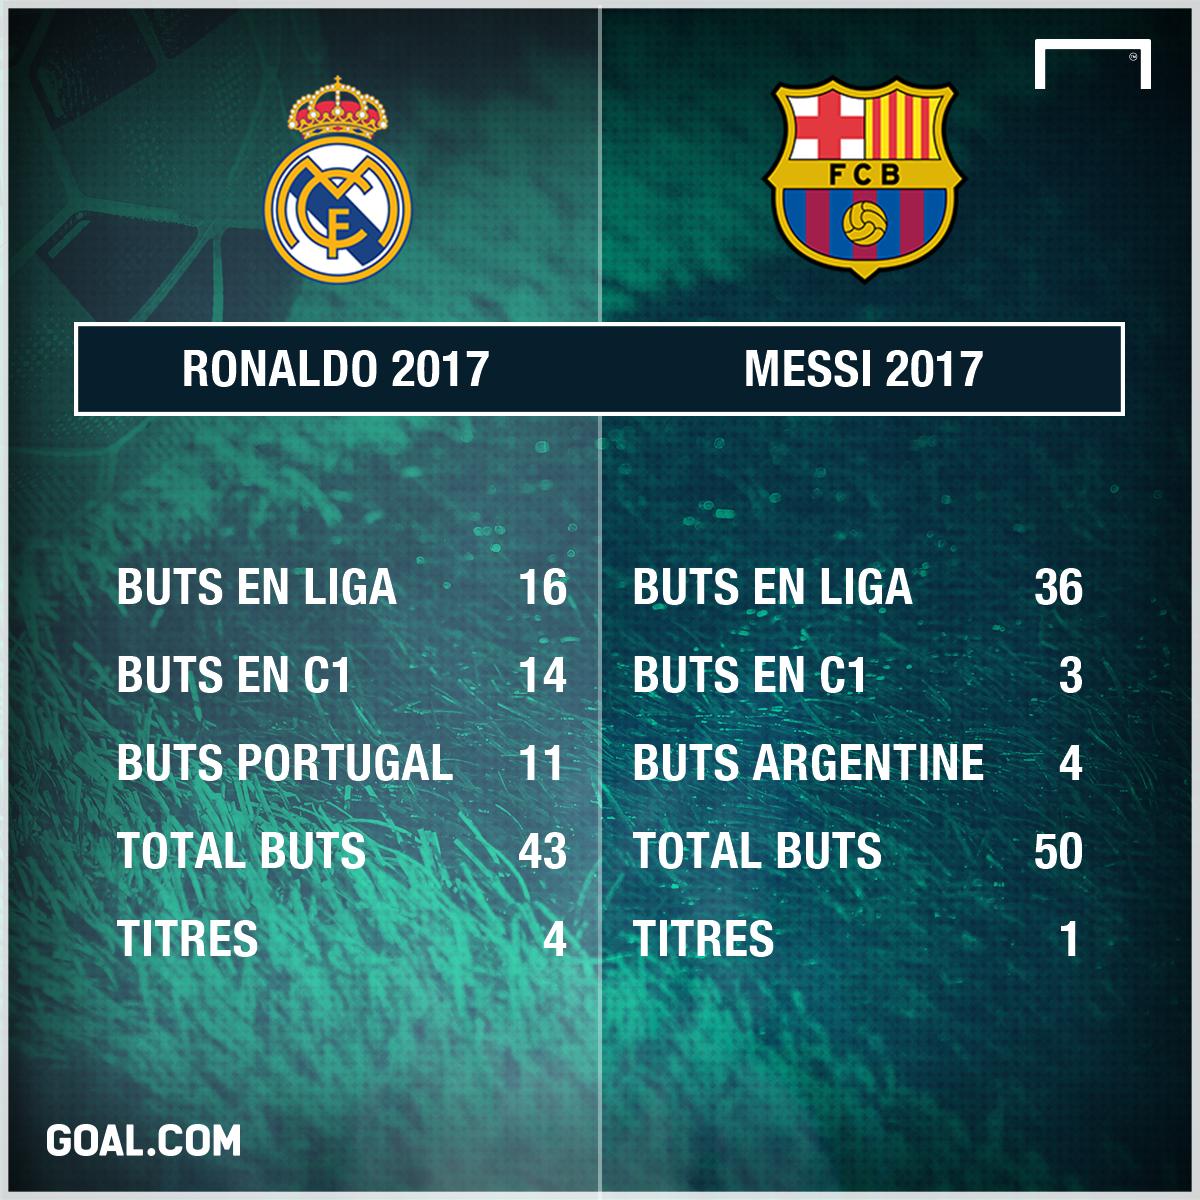 Ballon d'Or - Messi peut-il vraiment coiffer Ronaldo ?